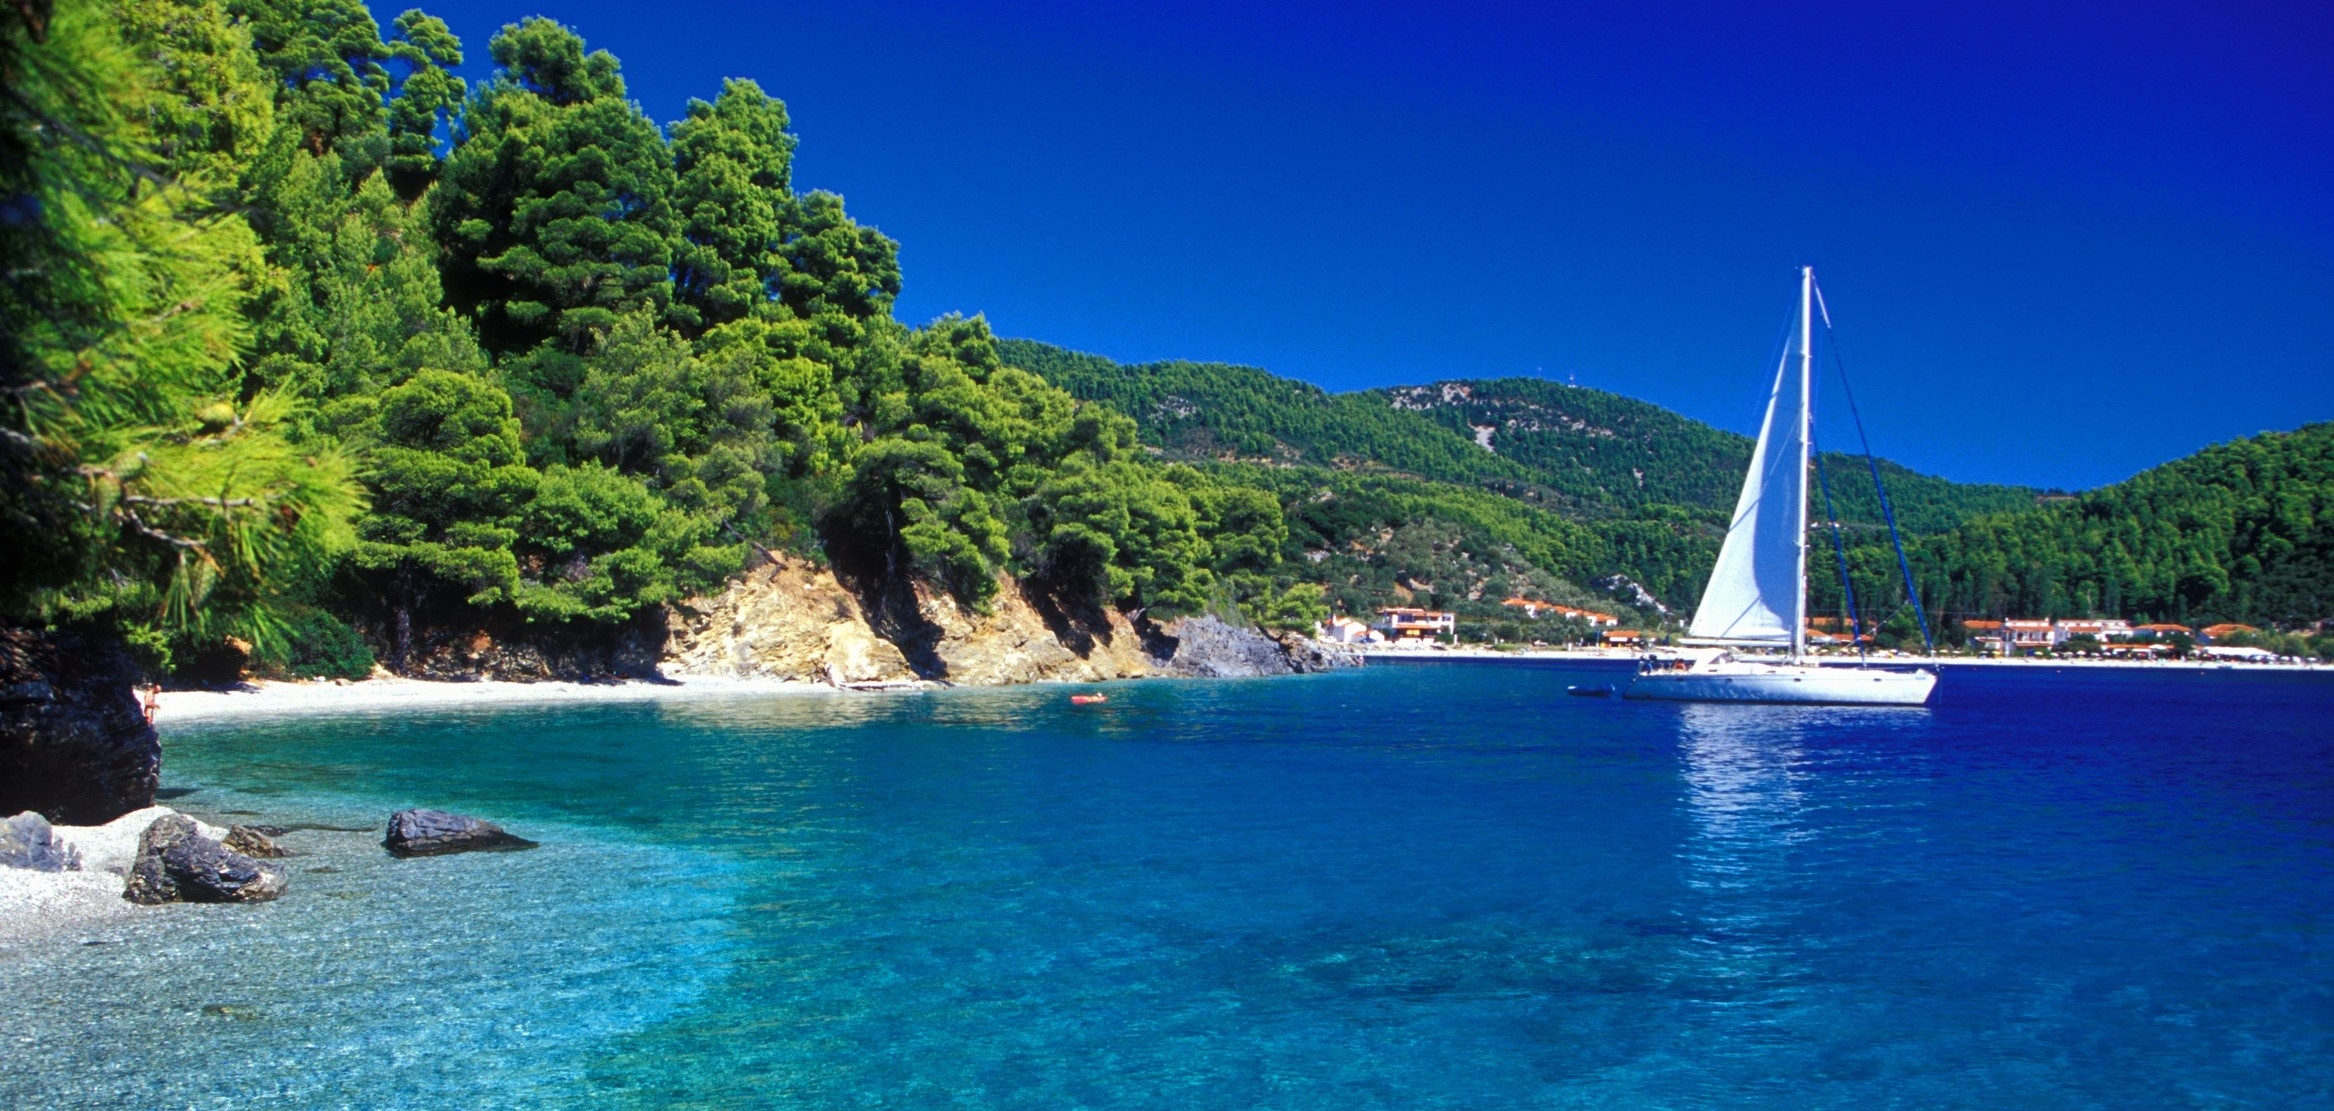 Skopelos Greece: Compare Skopelos to other Greek Islands ... Daily Kos